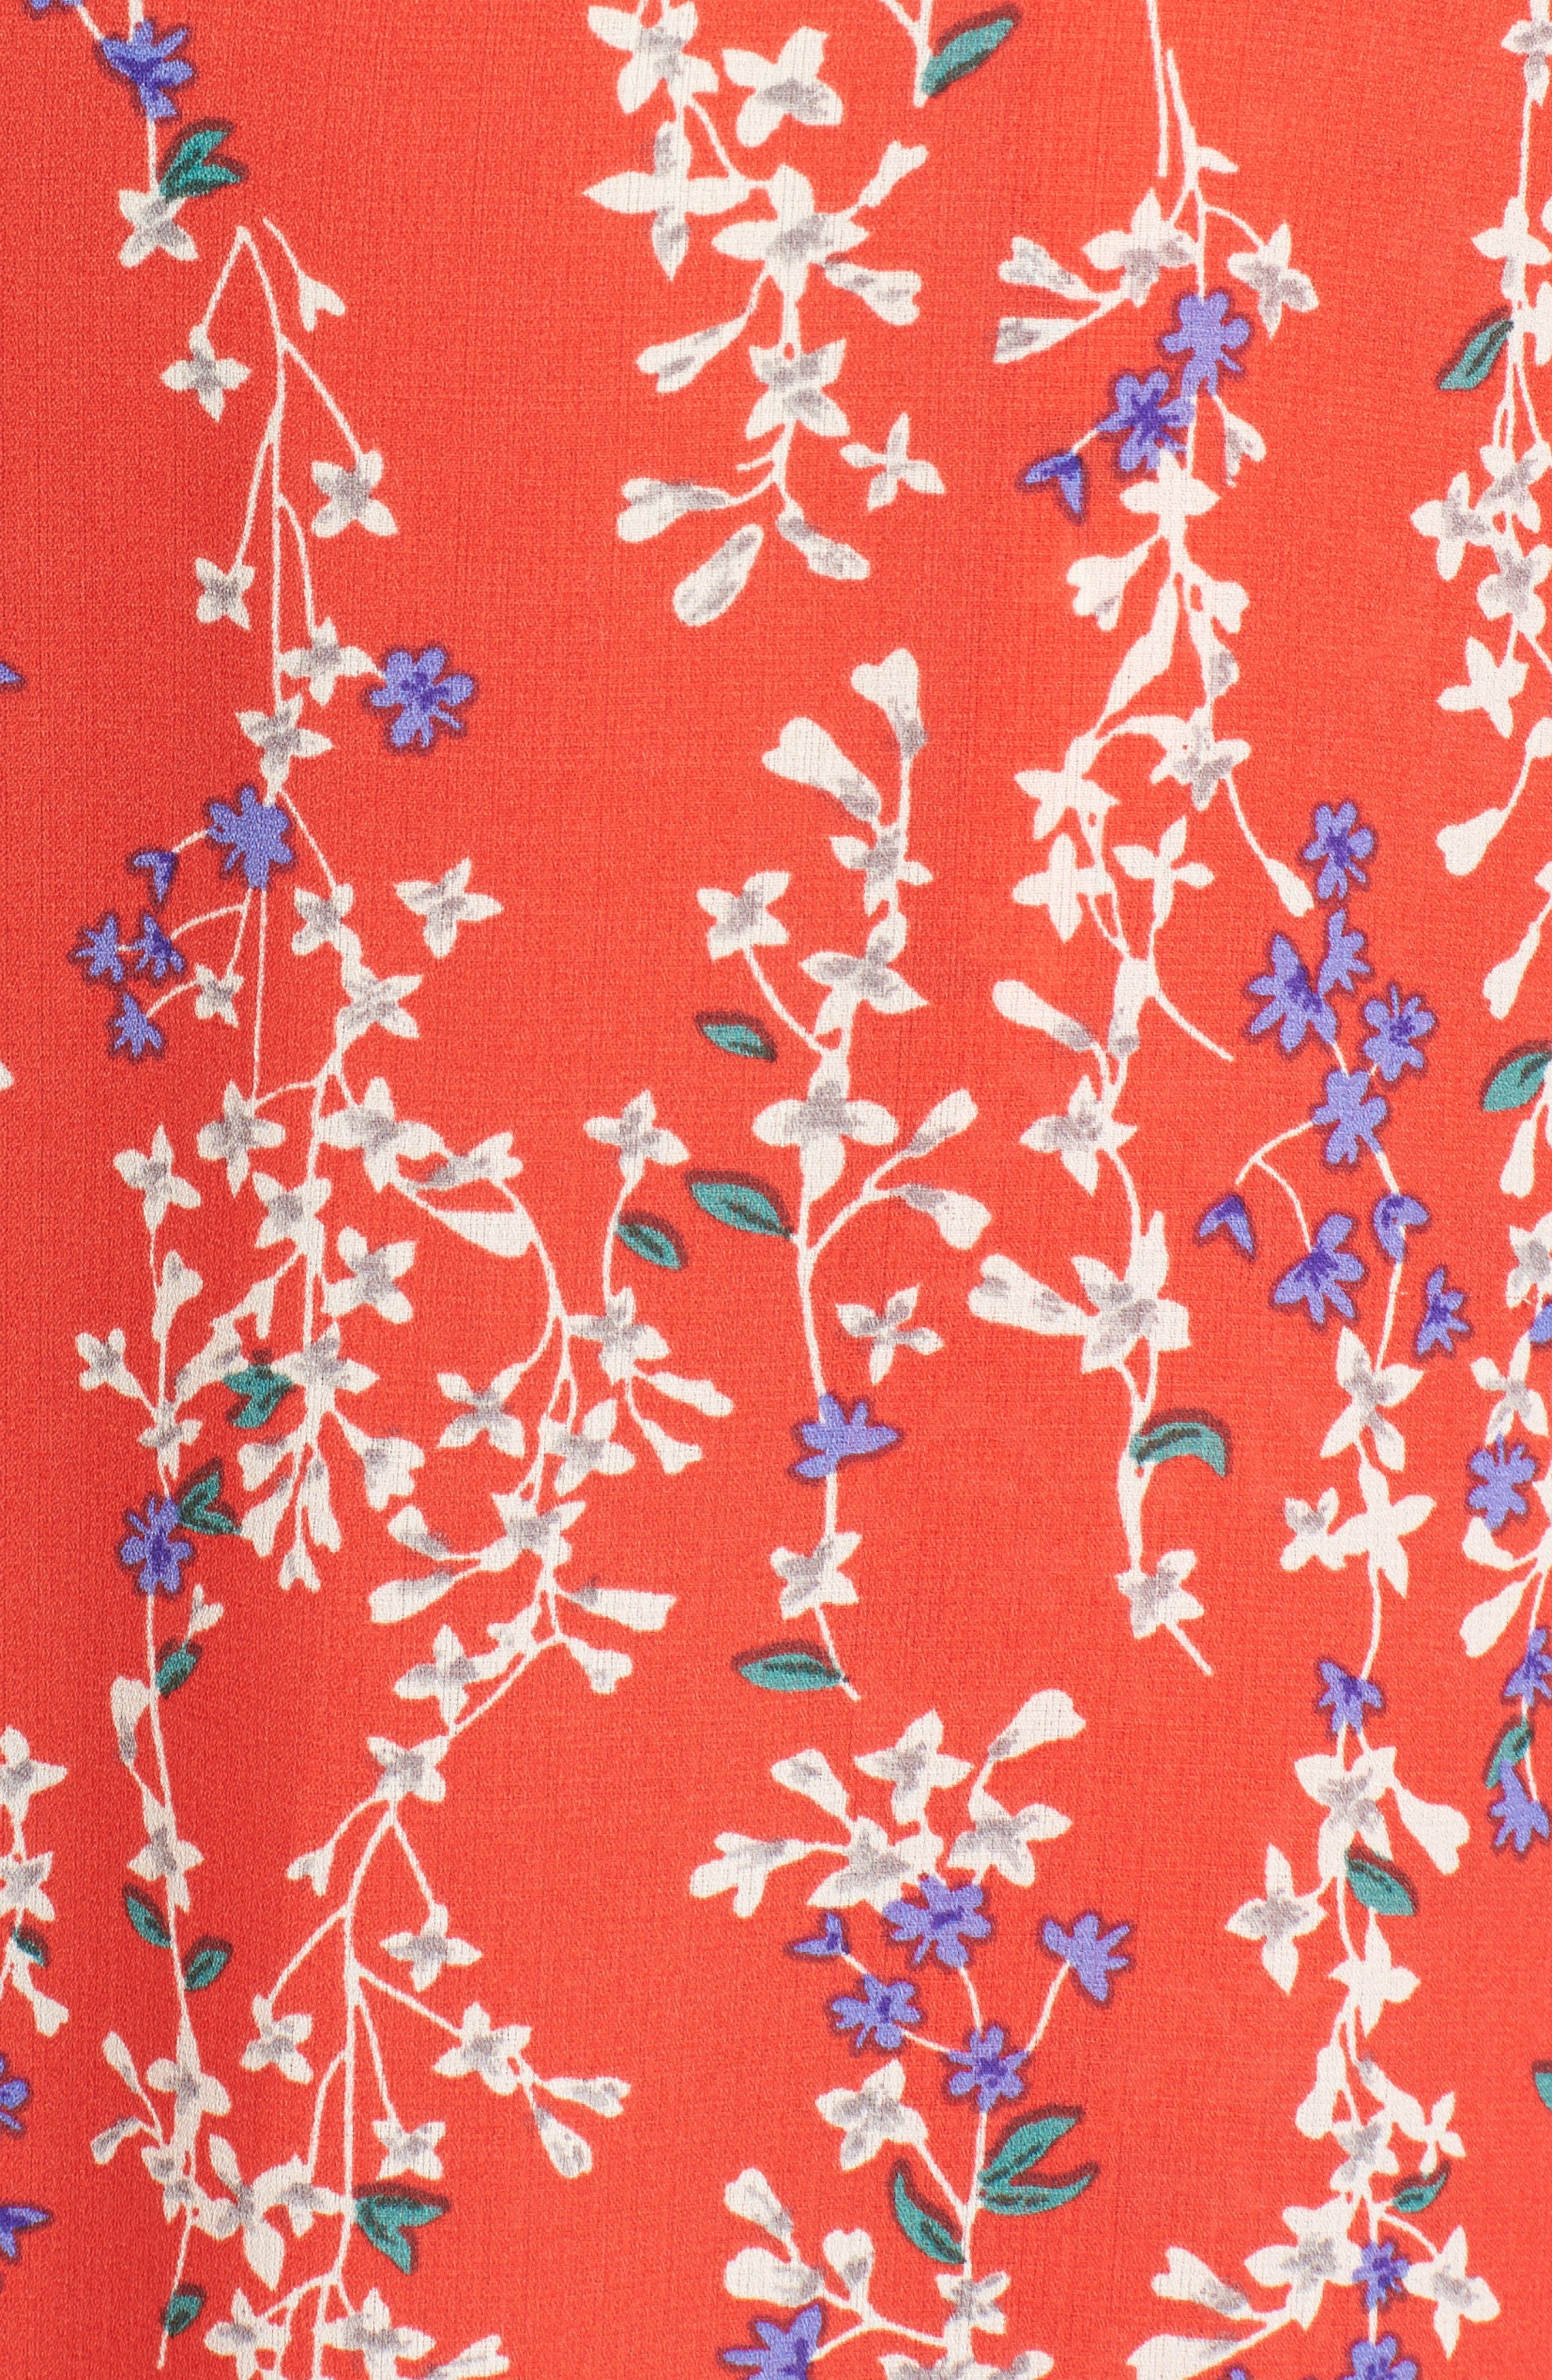 Floral Tie Front Split Hem Pants,                             Alternate thumbnail 7, color,                             Red Floral